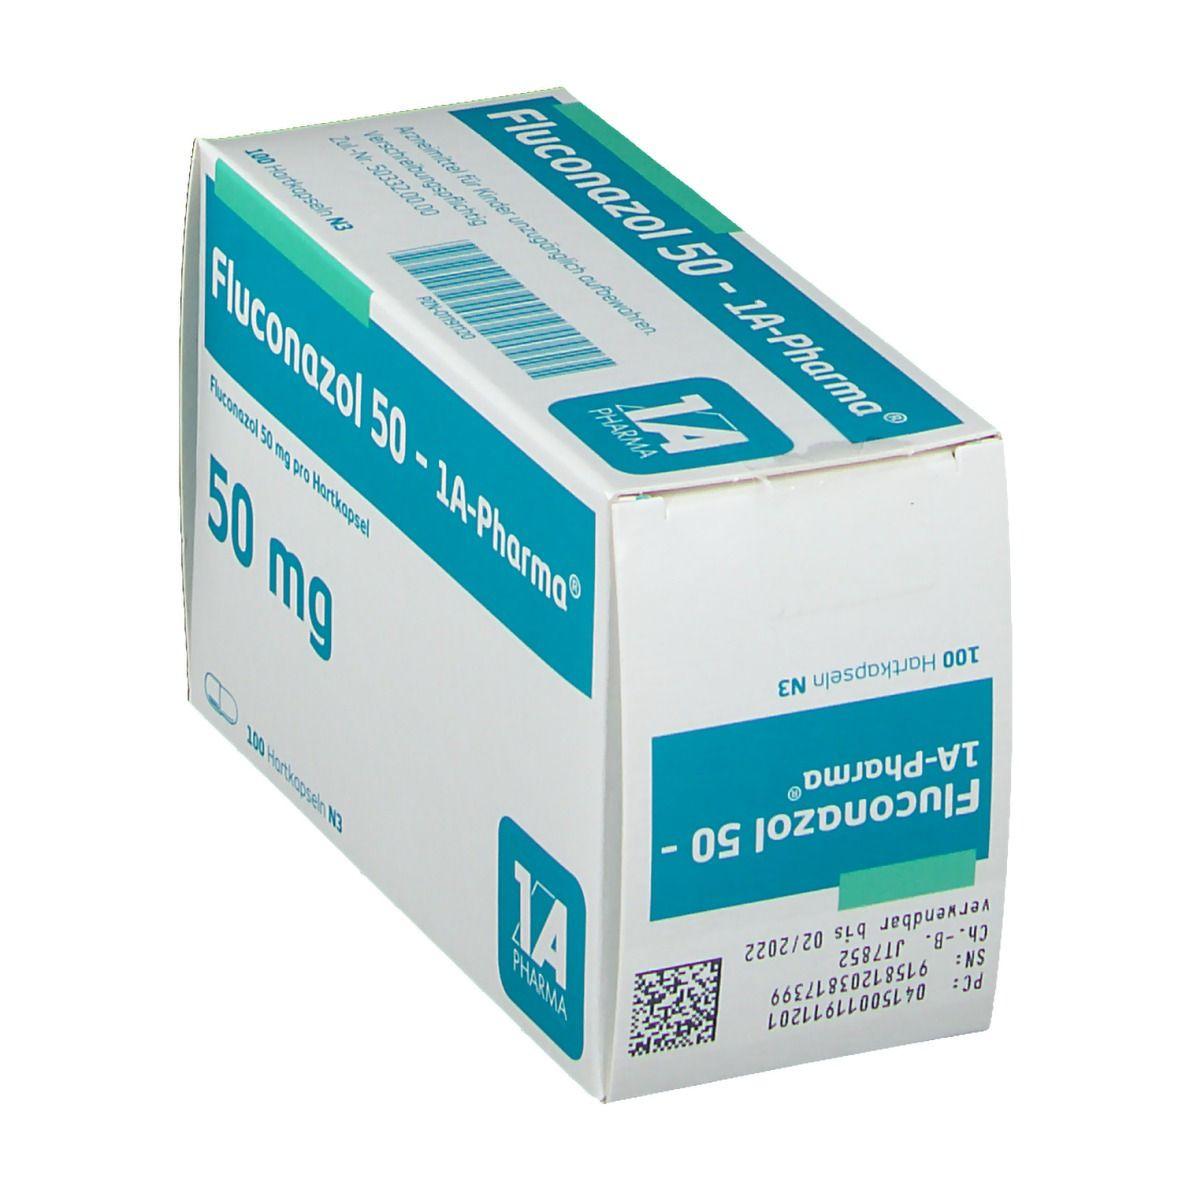 Fluconazol 50 1a Pharma Kapseln